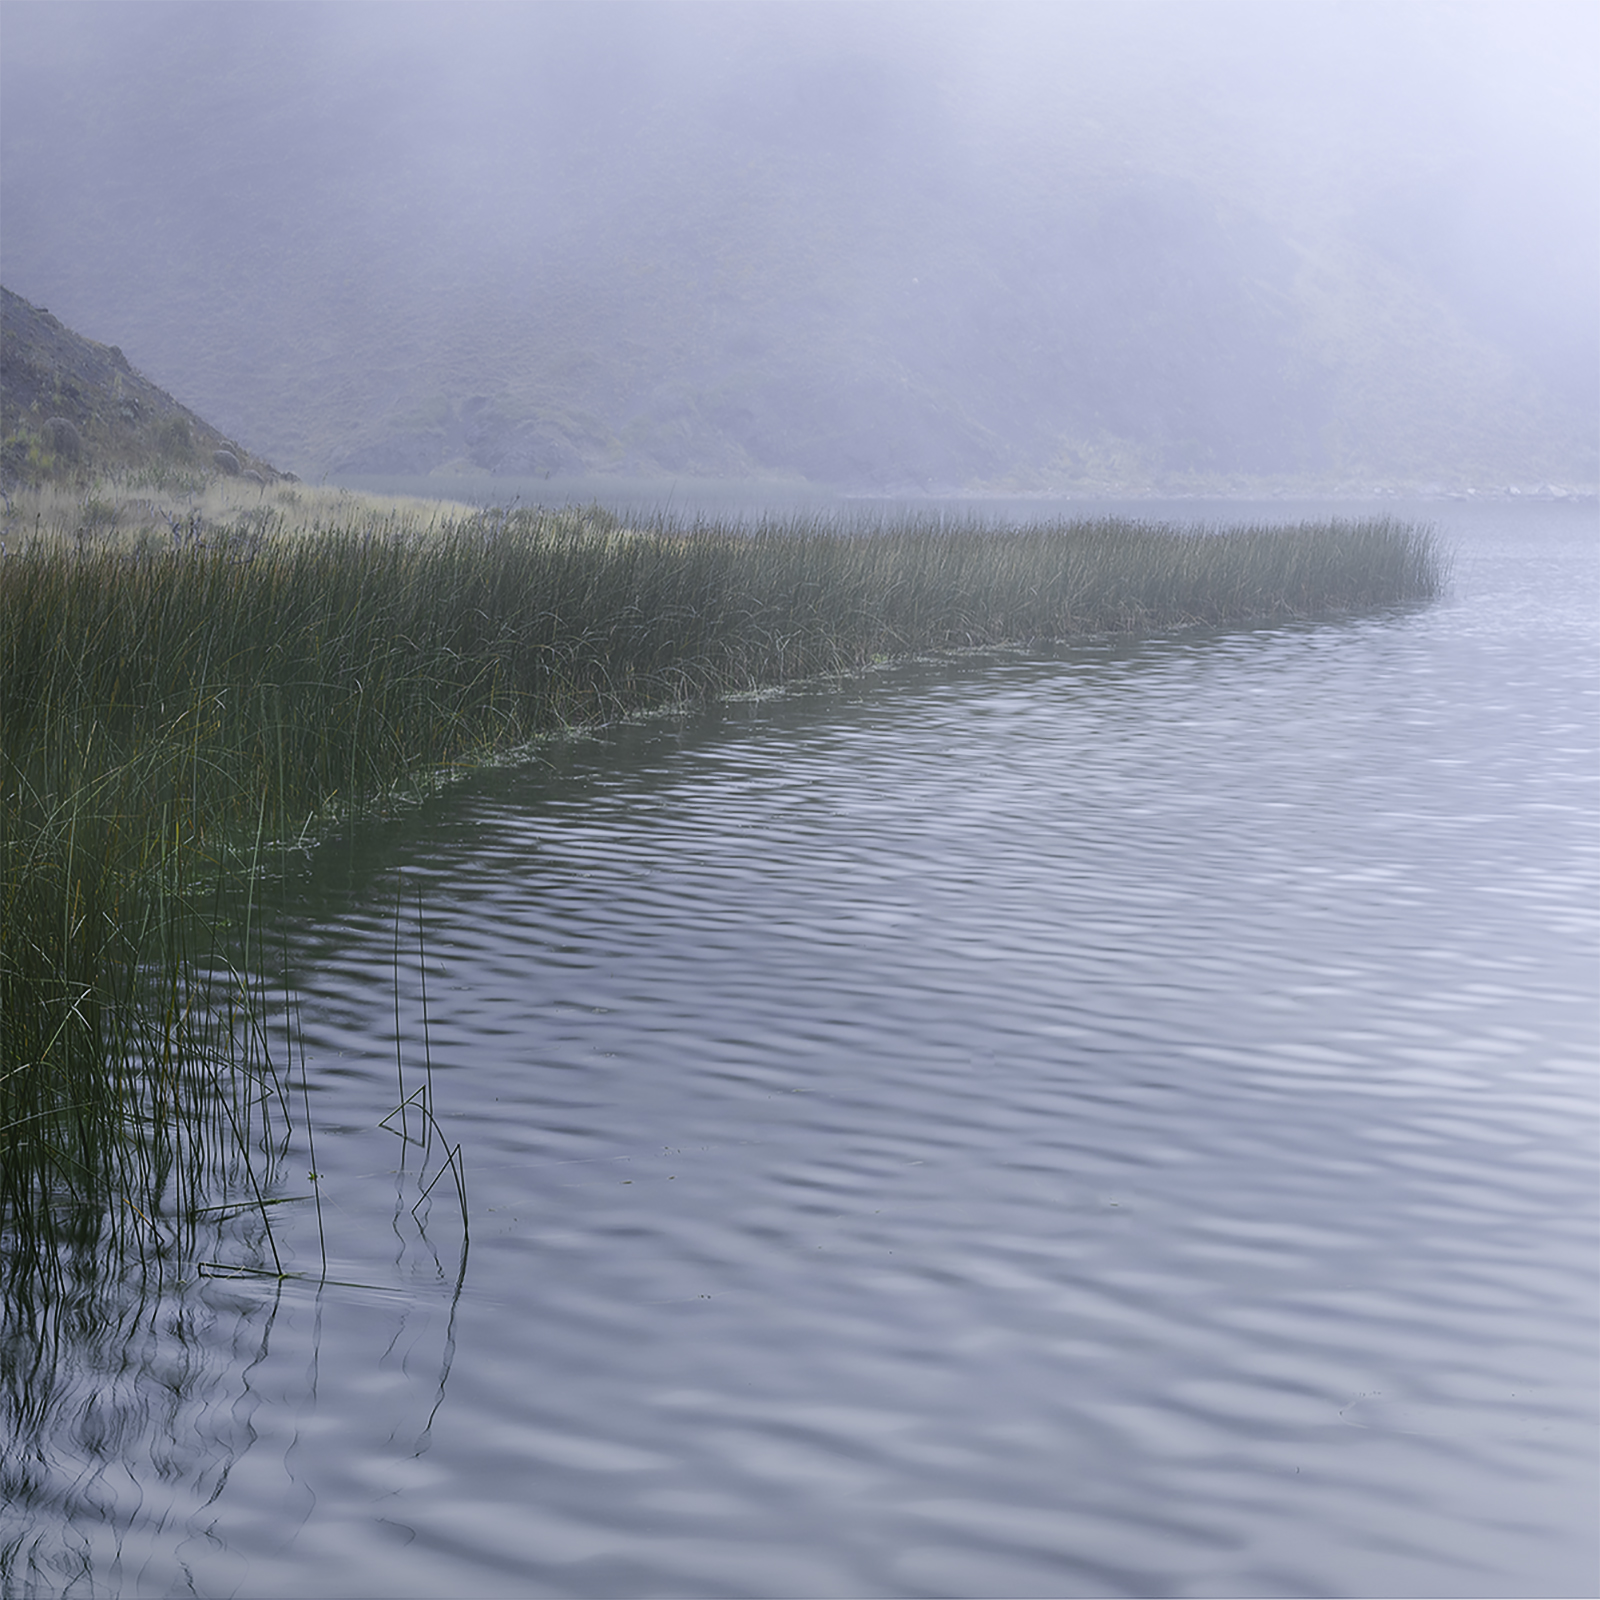 Reeds, study#2 - Torres del Paine, Patagonia